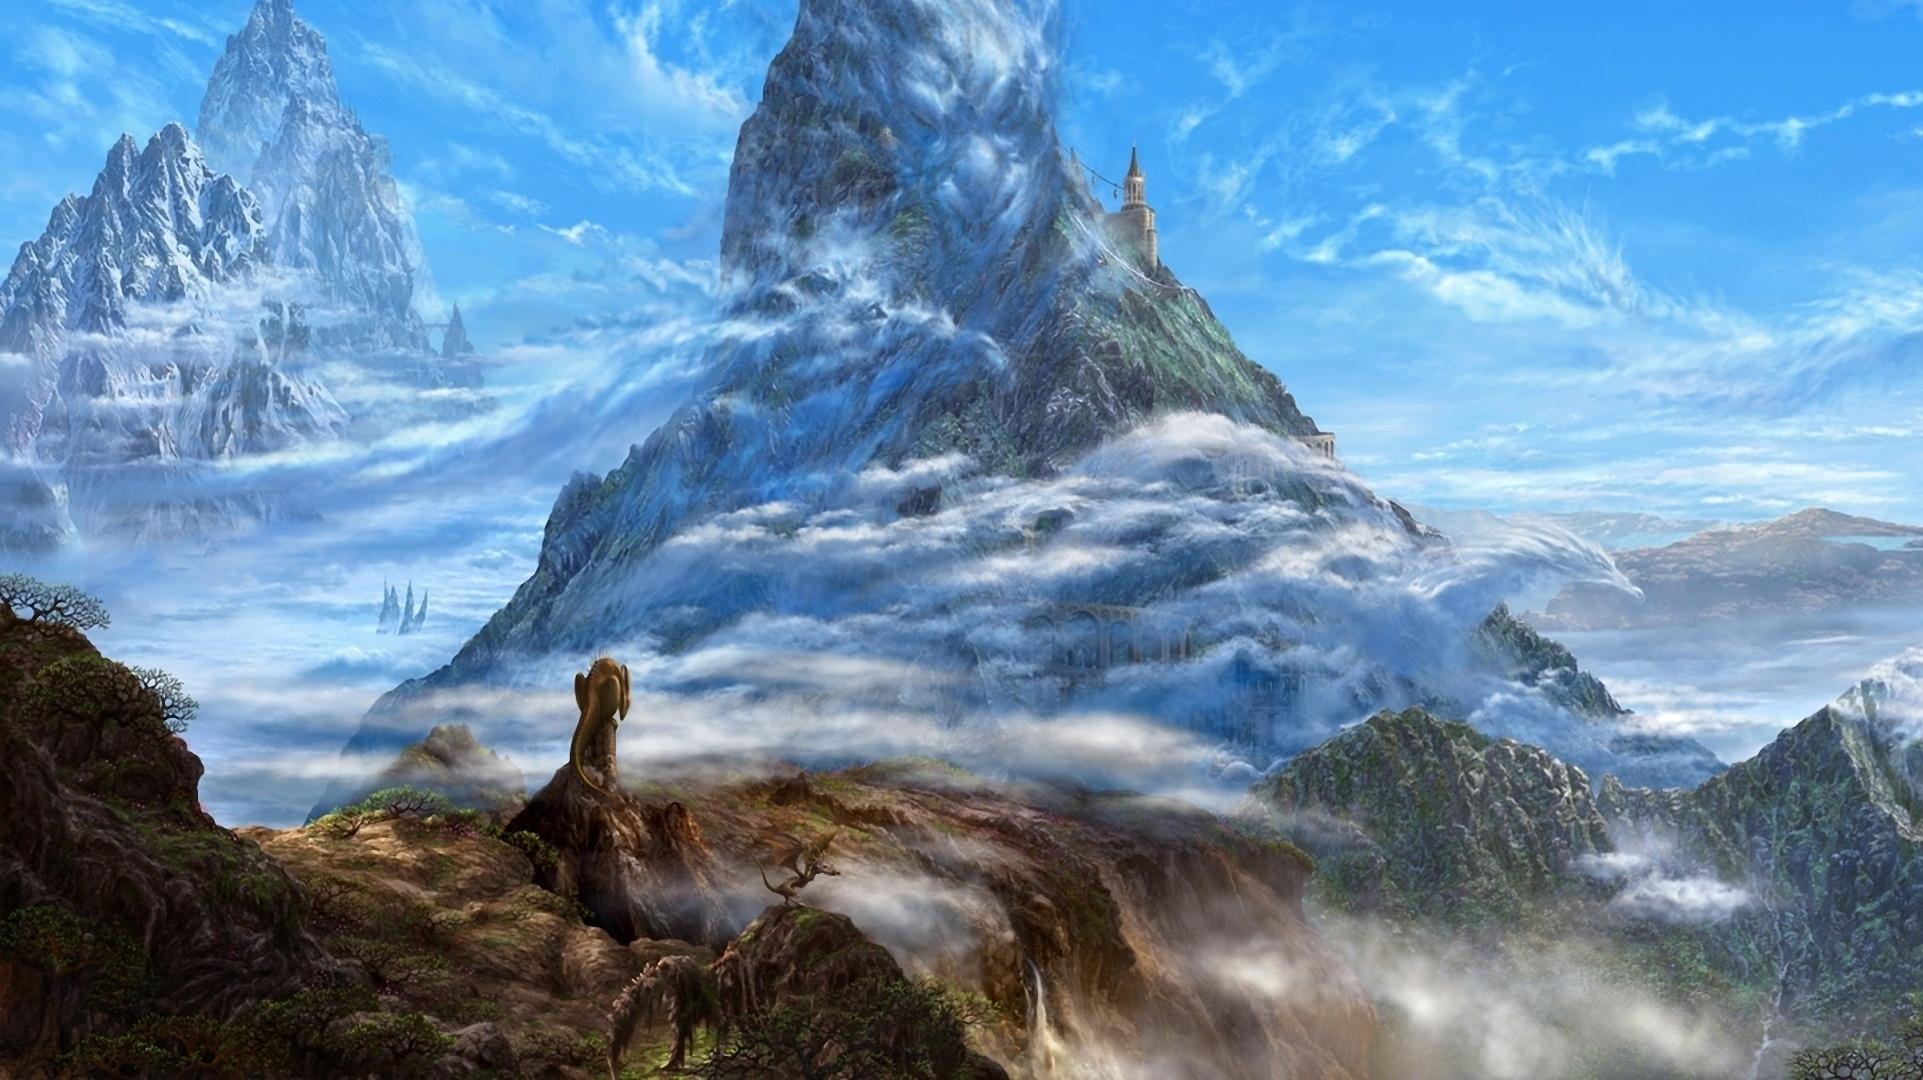 Cool Wallpaper Mountain Fantasy - wallls  2018_918485.jpg